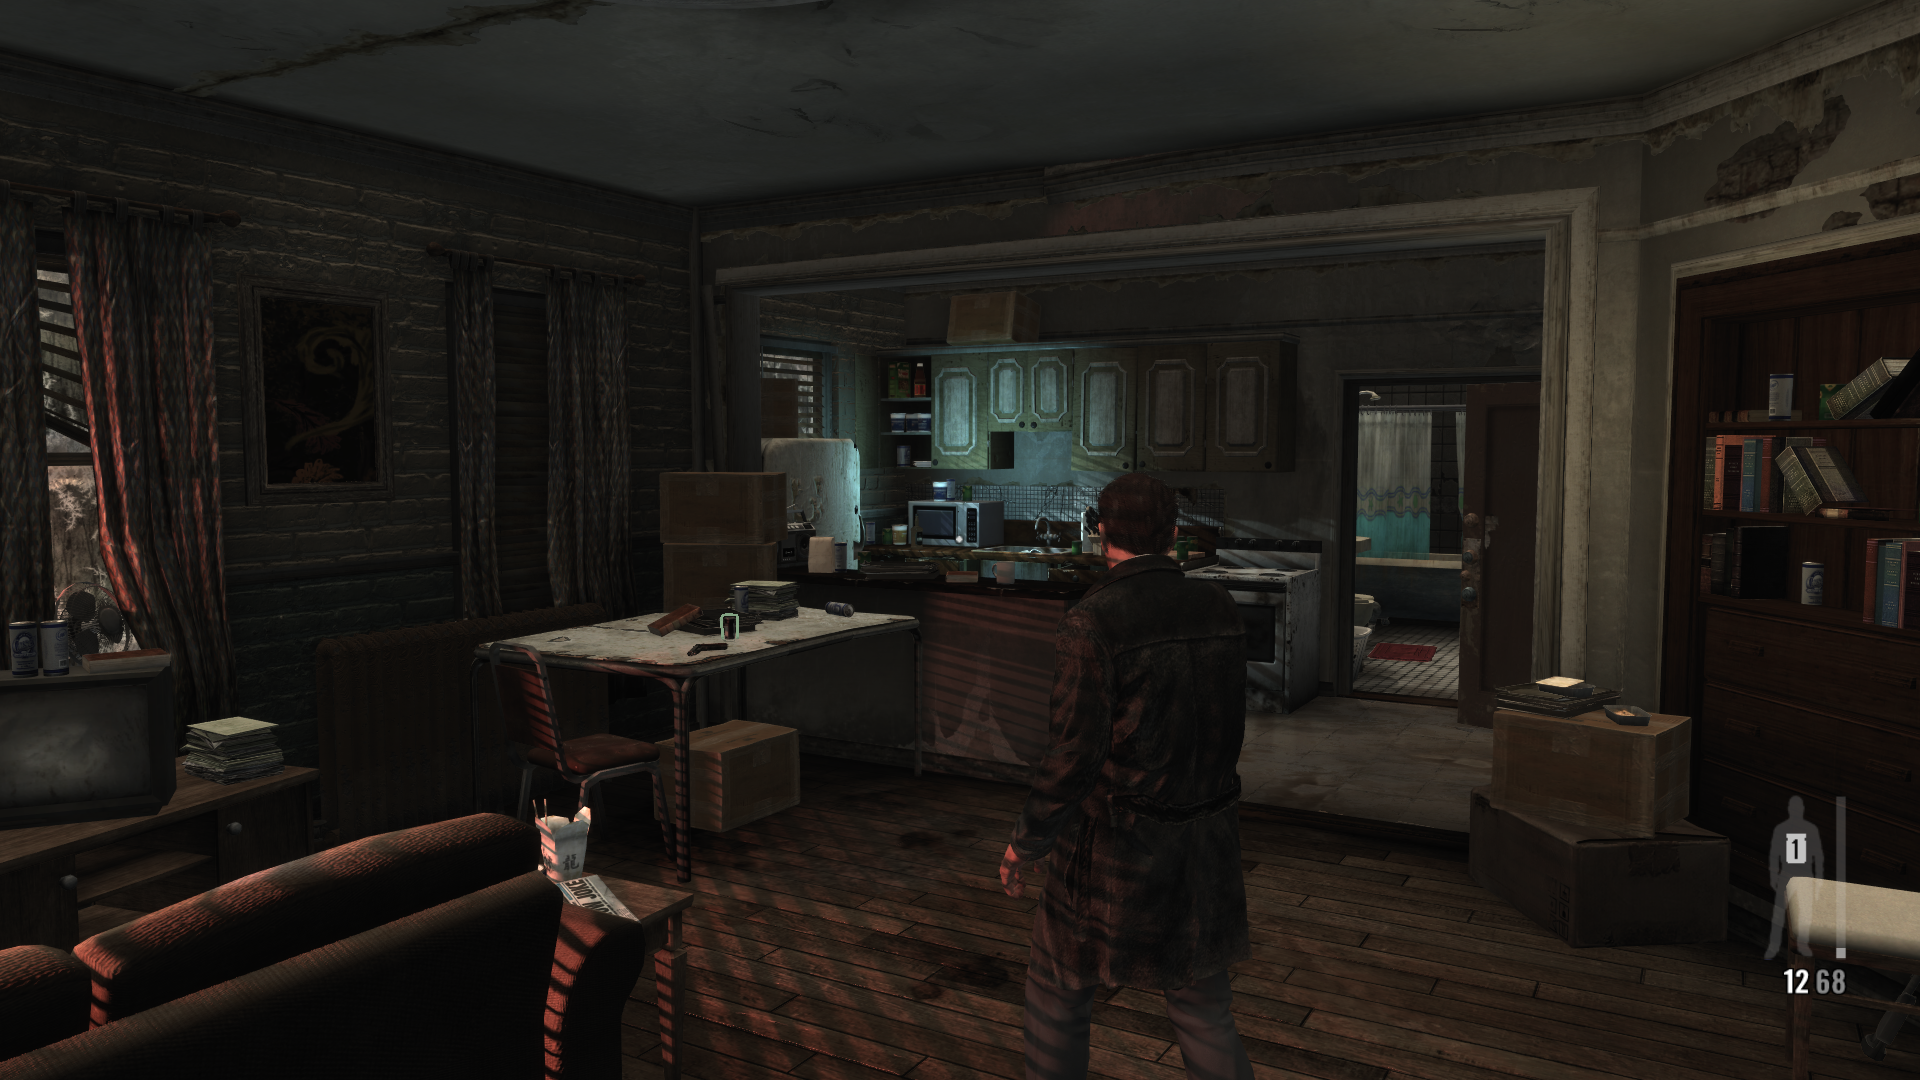 Max_Payne_3_Screenshot_2019.09.09_-_18.2